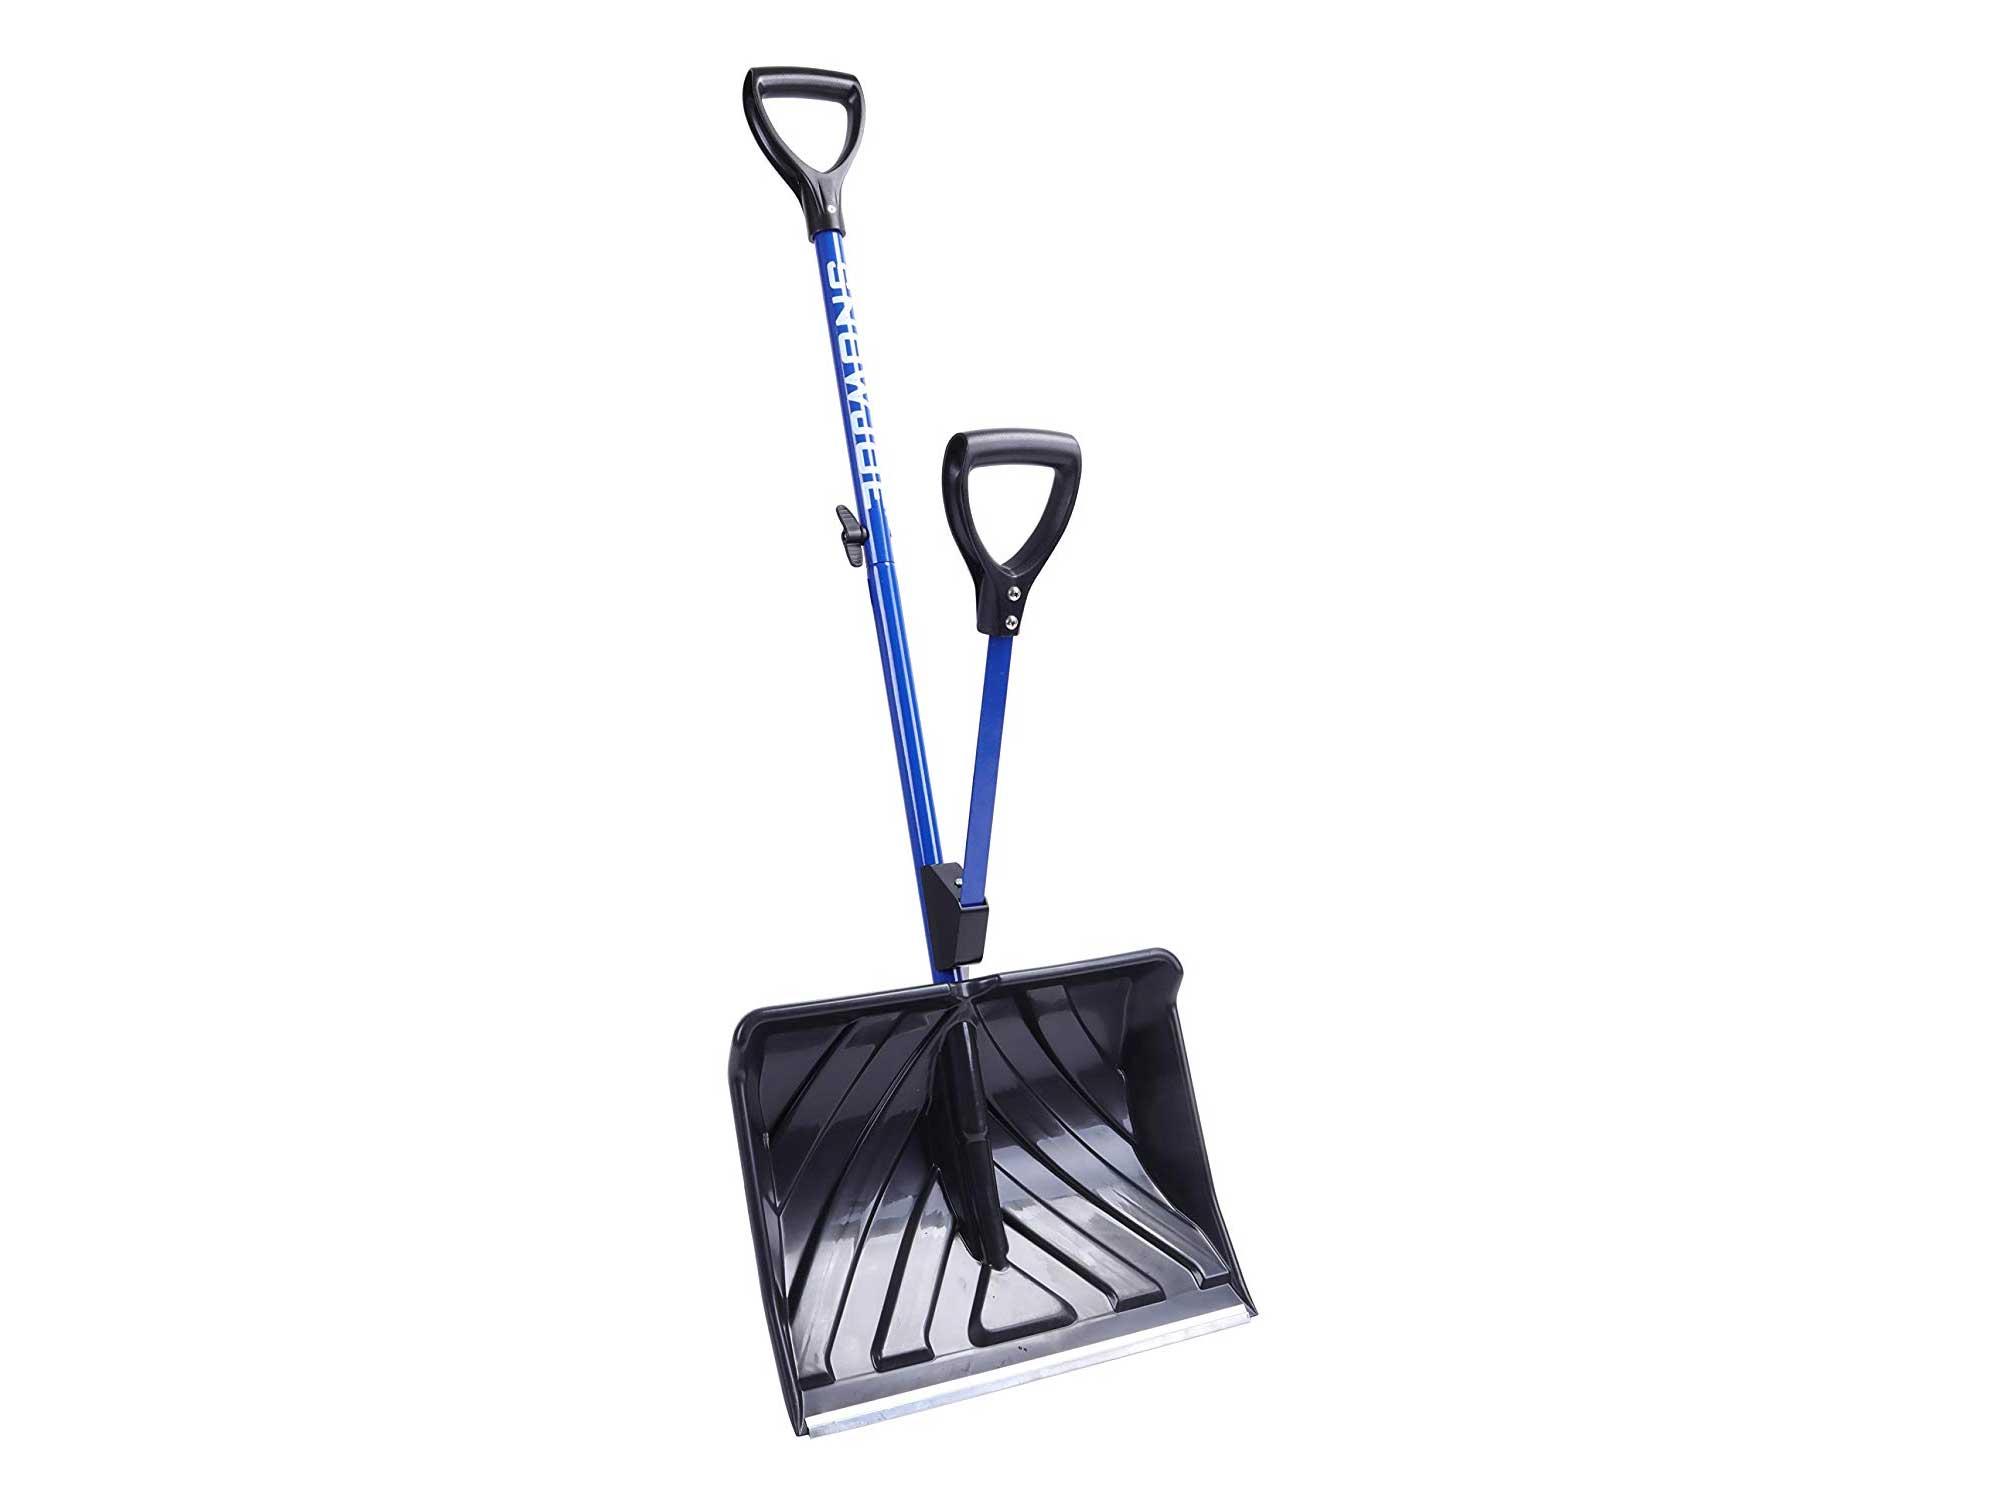 Snow Joe snow shovel